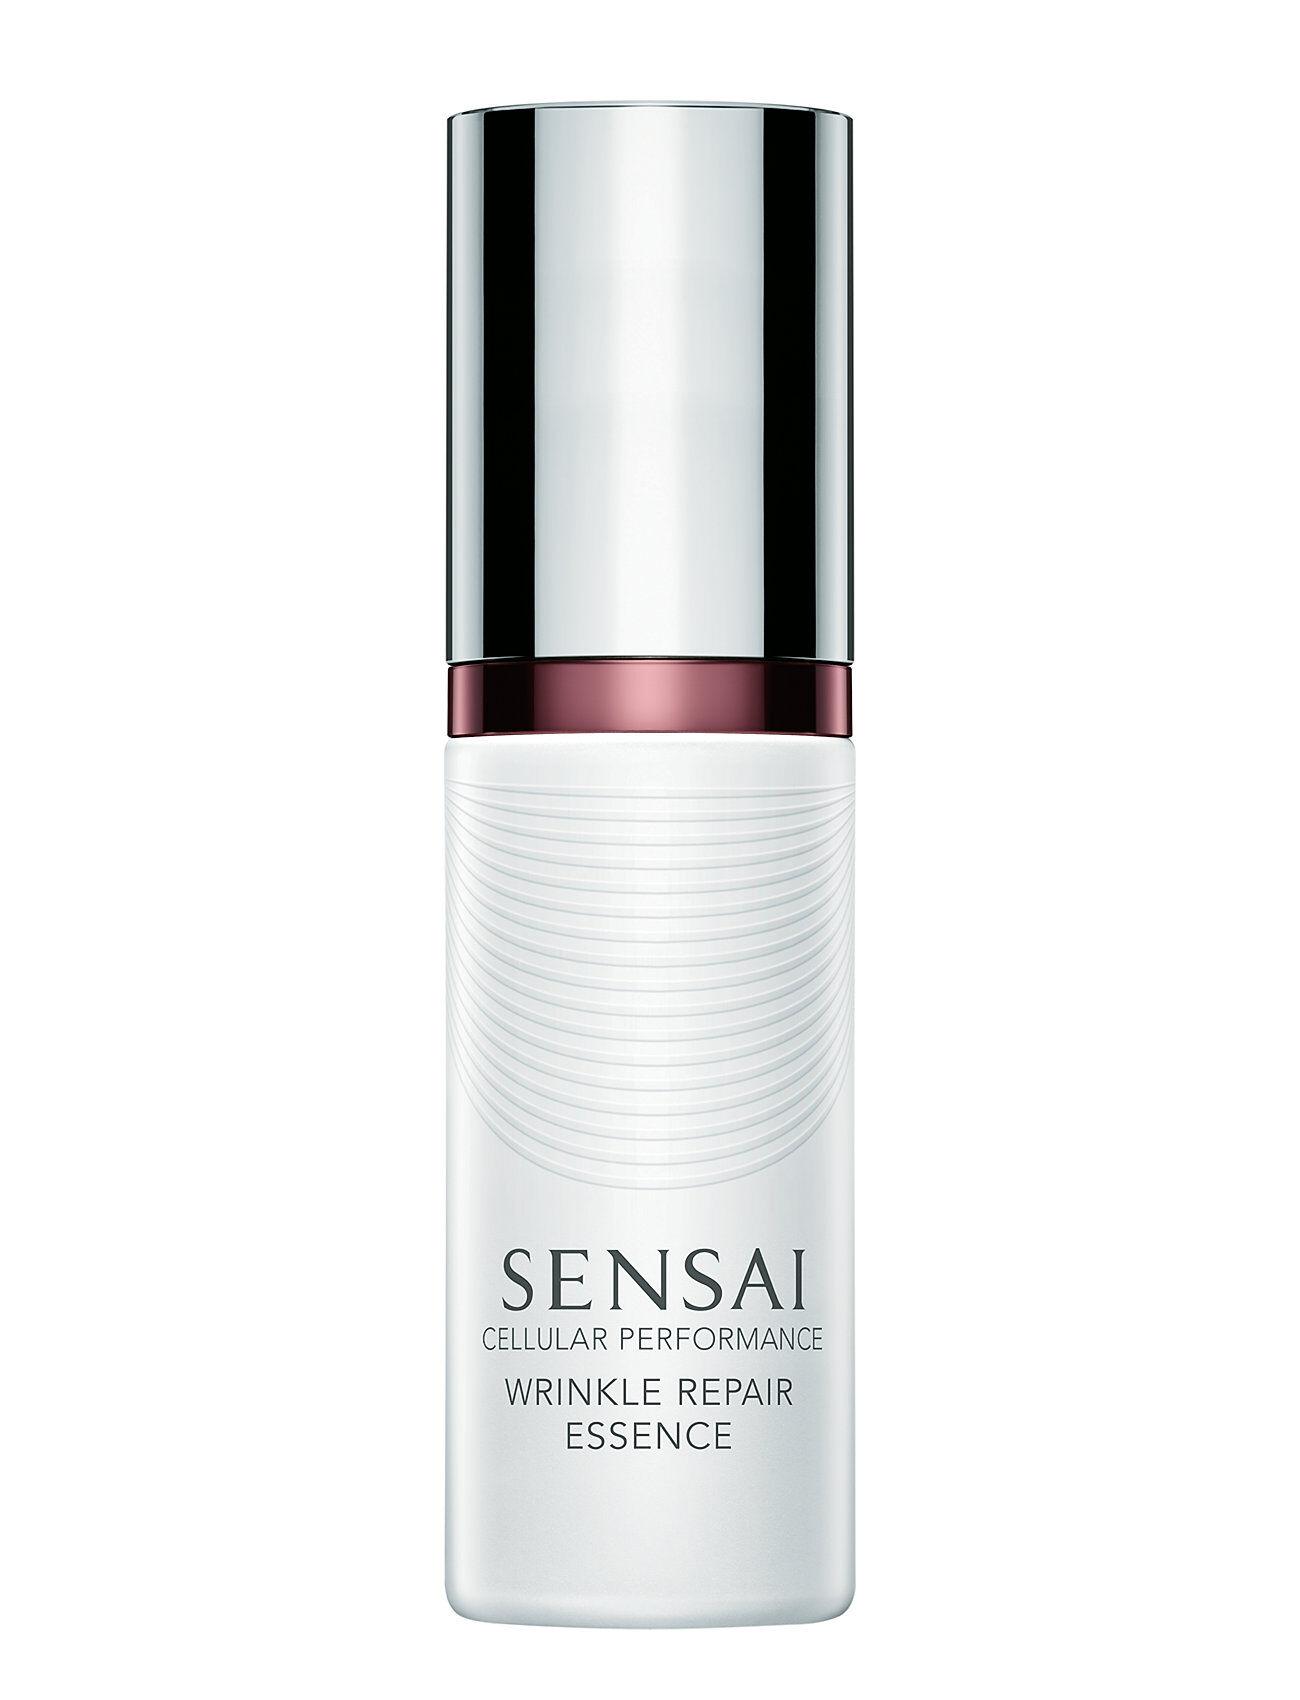 SENSAI Cellular Performance Wrinkle Repair Essence Seerumi Kasvot Ihonhoito Monivärinen/Kuvioitu SENSAI